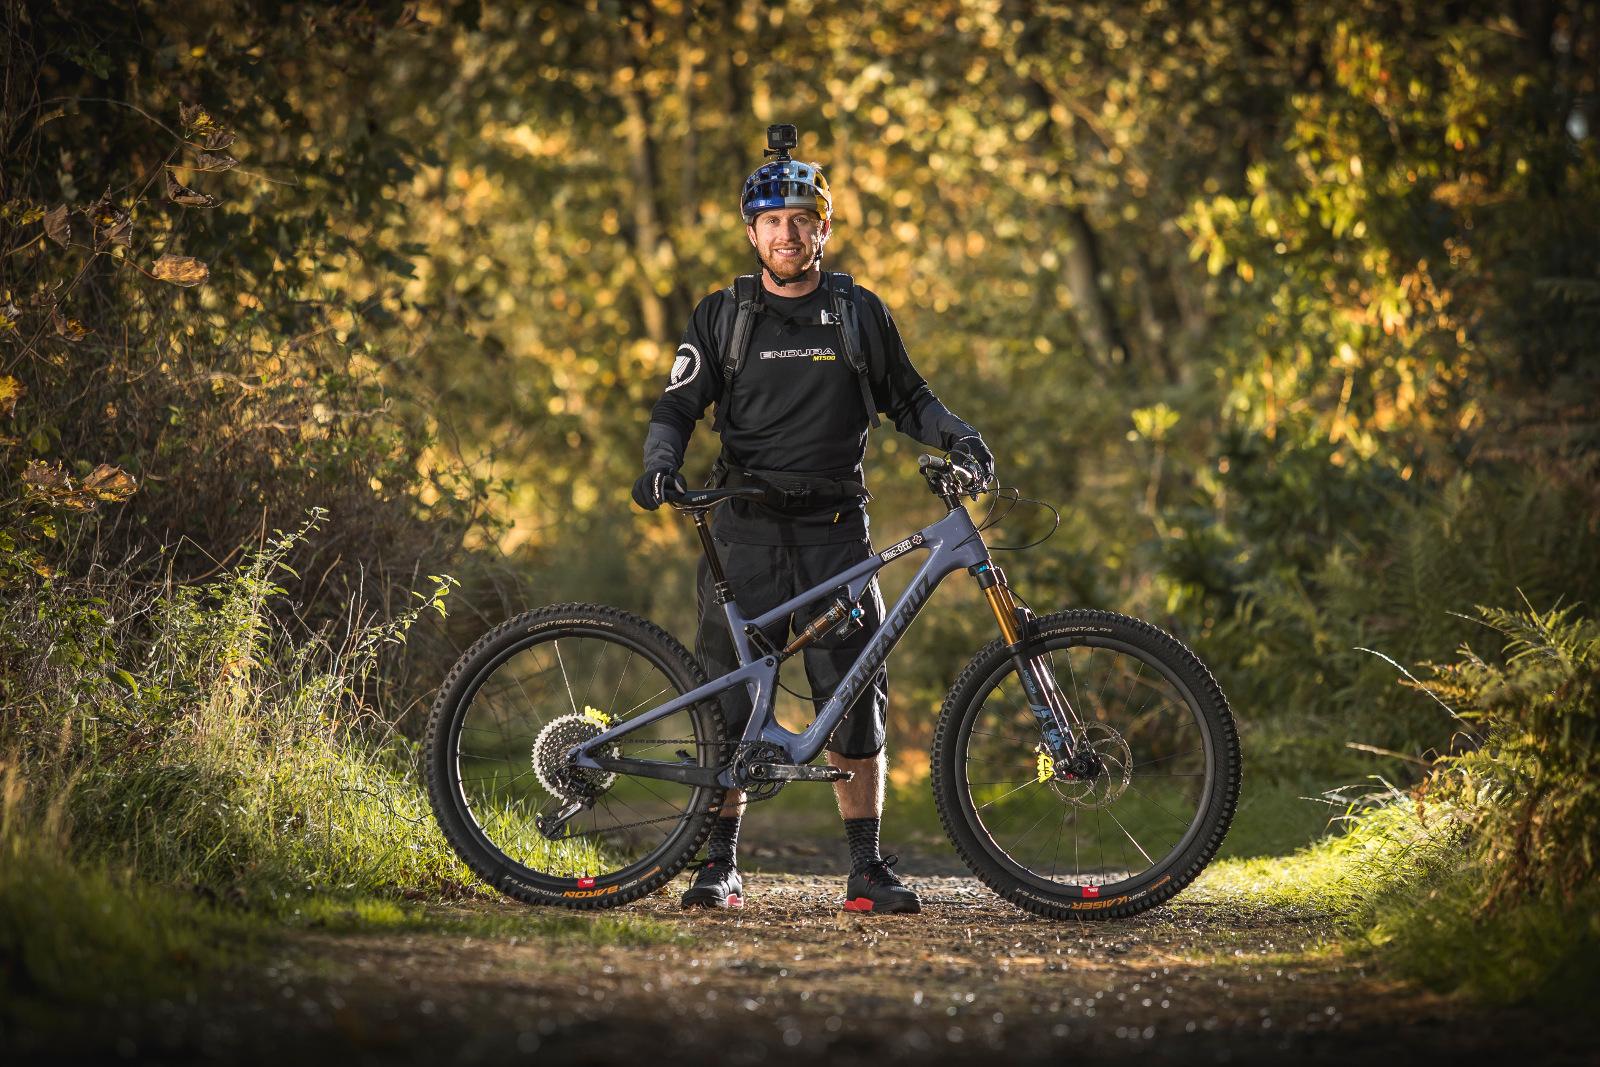 Mtb Mag Com Mountain Bike Magazine Video Danny Macaskill Challenges Danny Macaskill